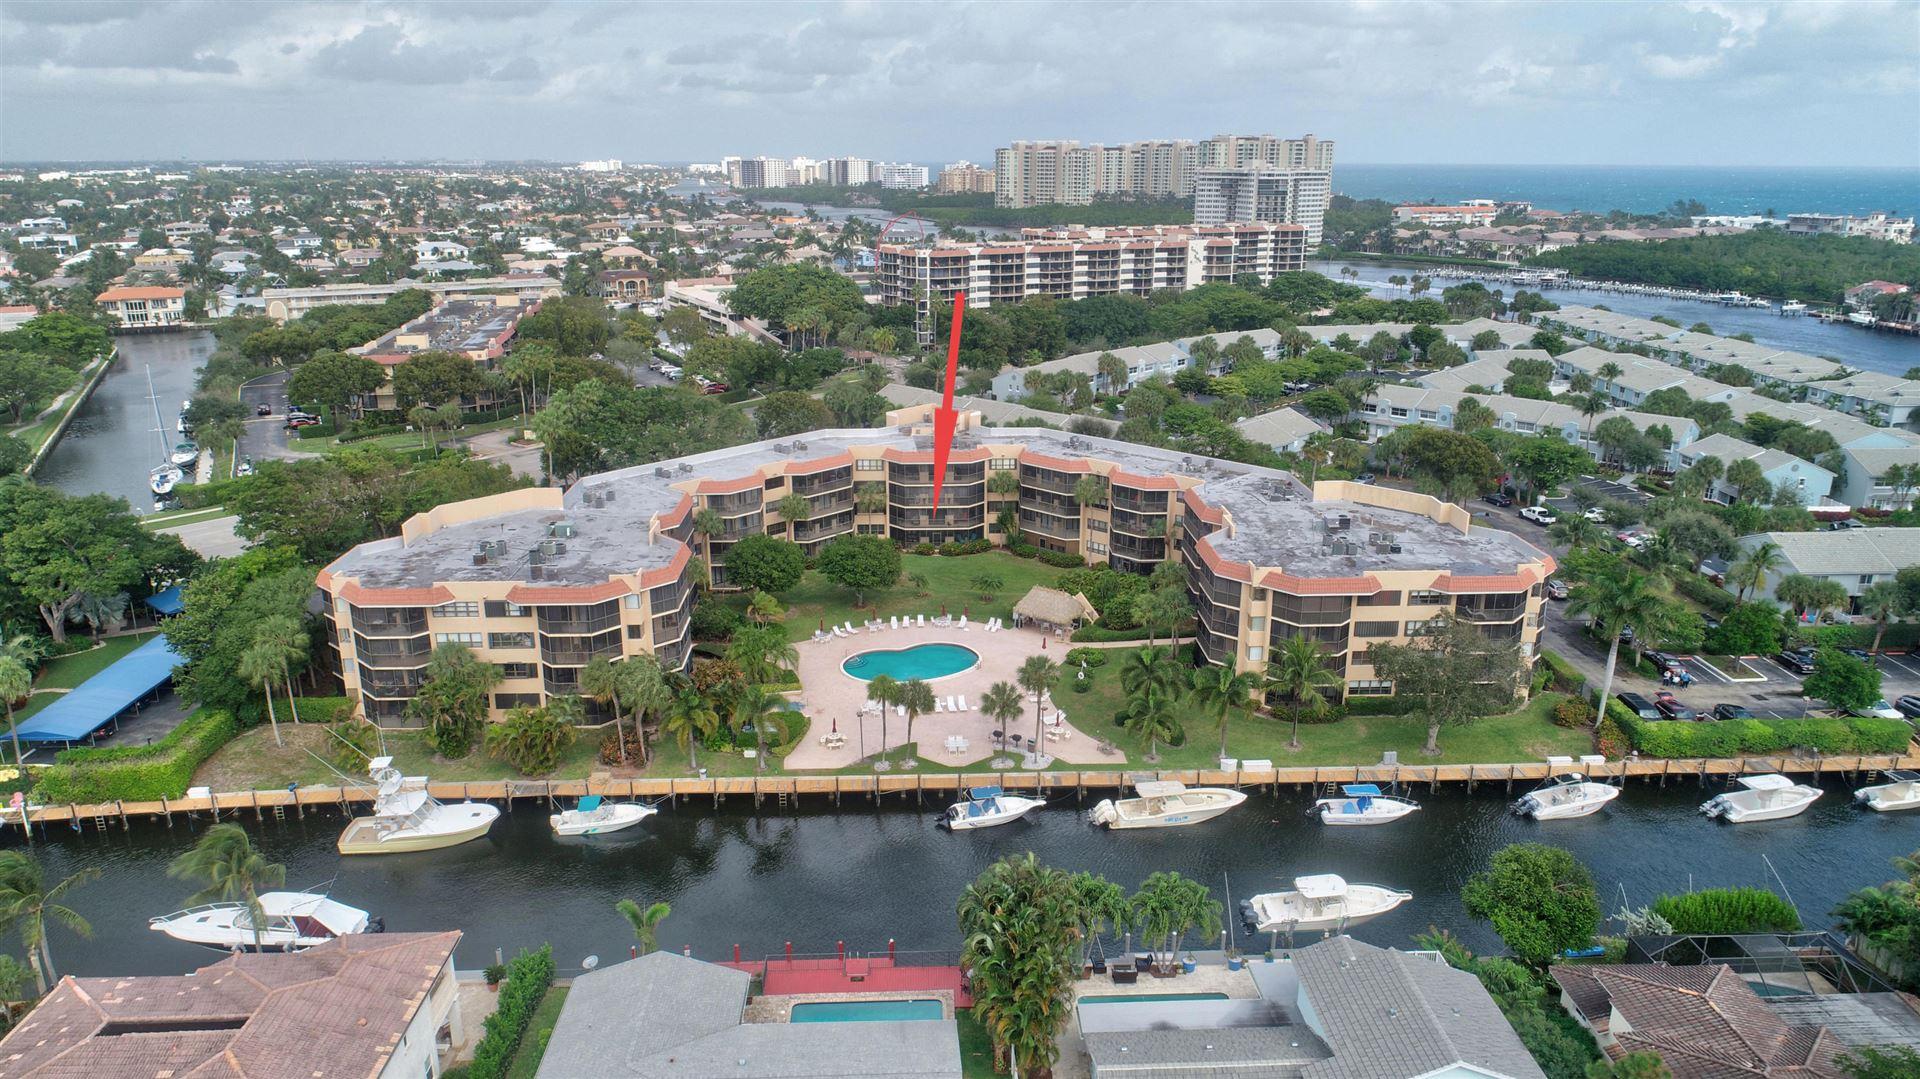 800 Jeffery Street #207, Boca Raton, FL 33487 - #: RX-10593825